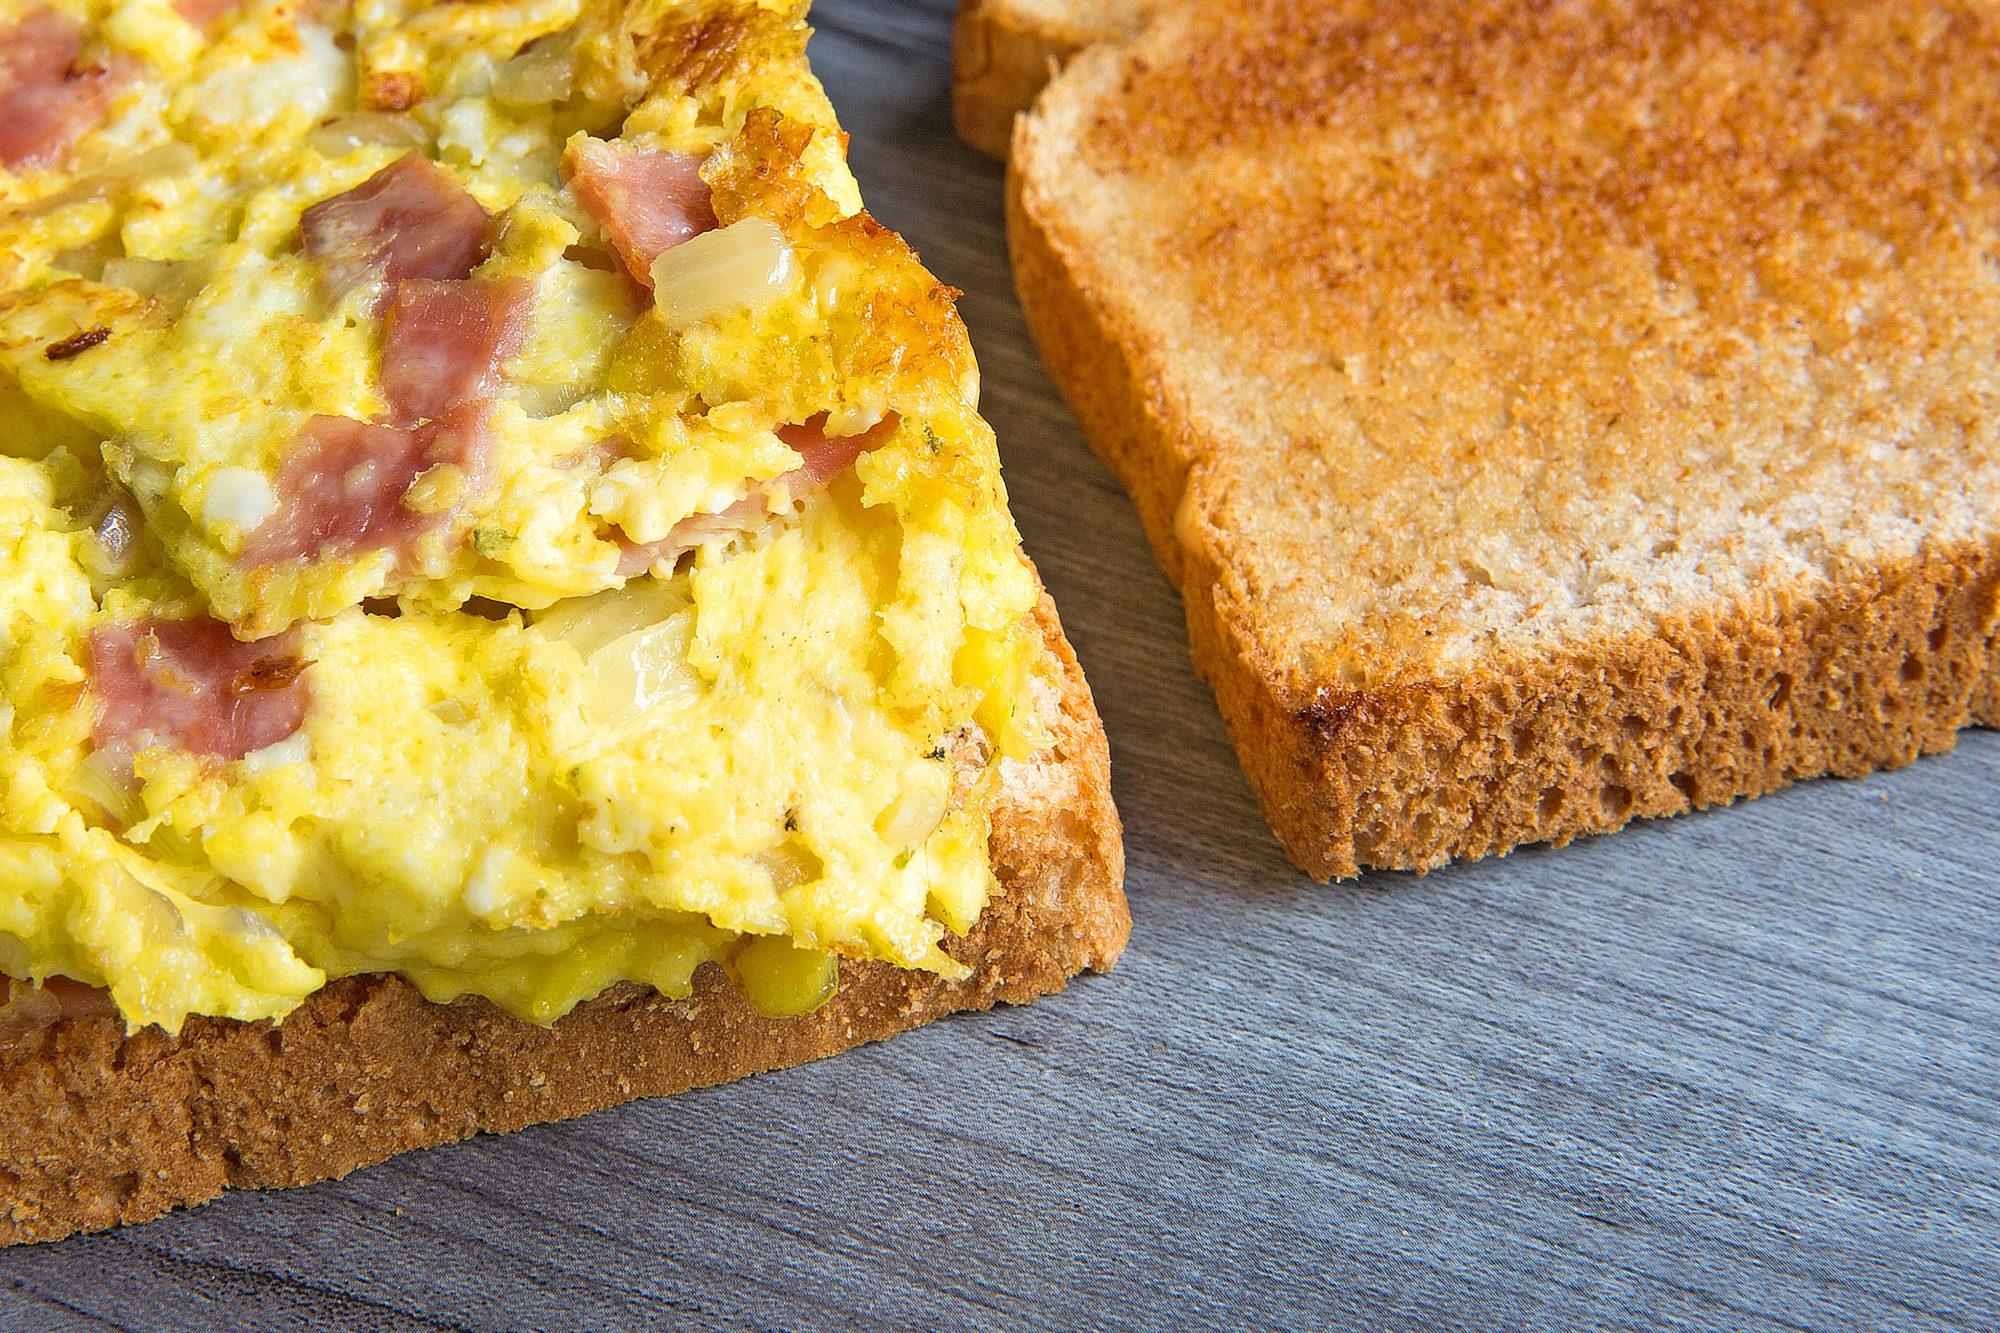 getty-egg-sandwich-image